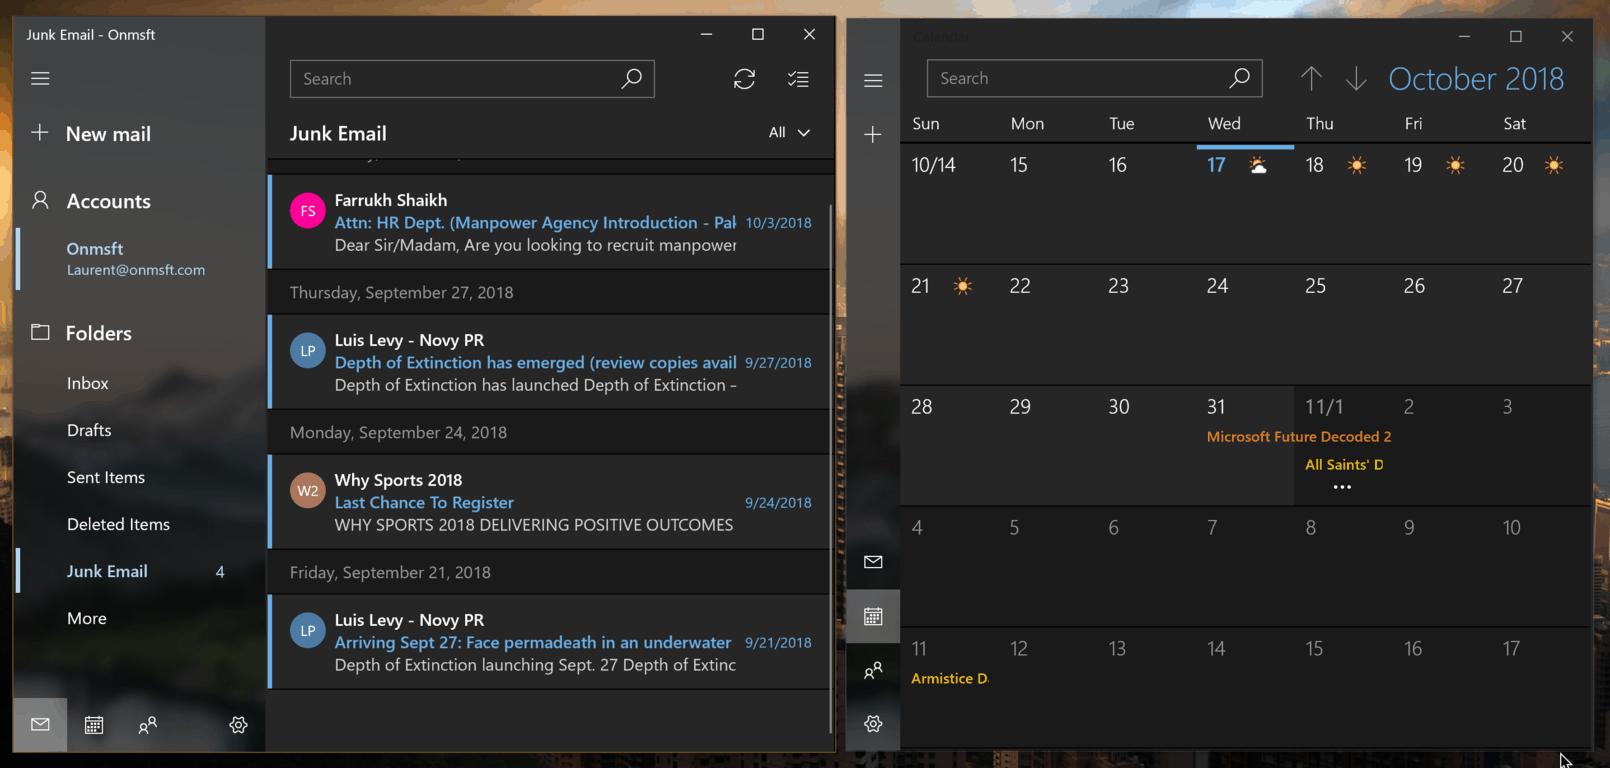 Windows 10 Mail and Calendar apps to get a slightly lighter dark mode OnMSFT.com October 17, 2018